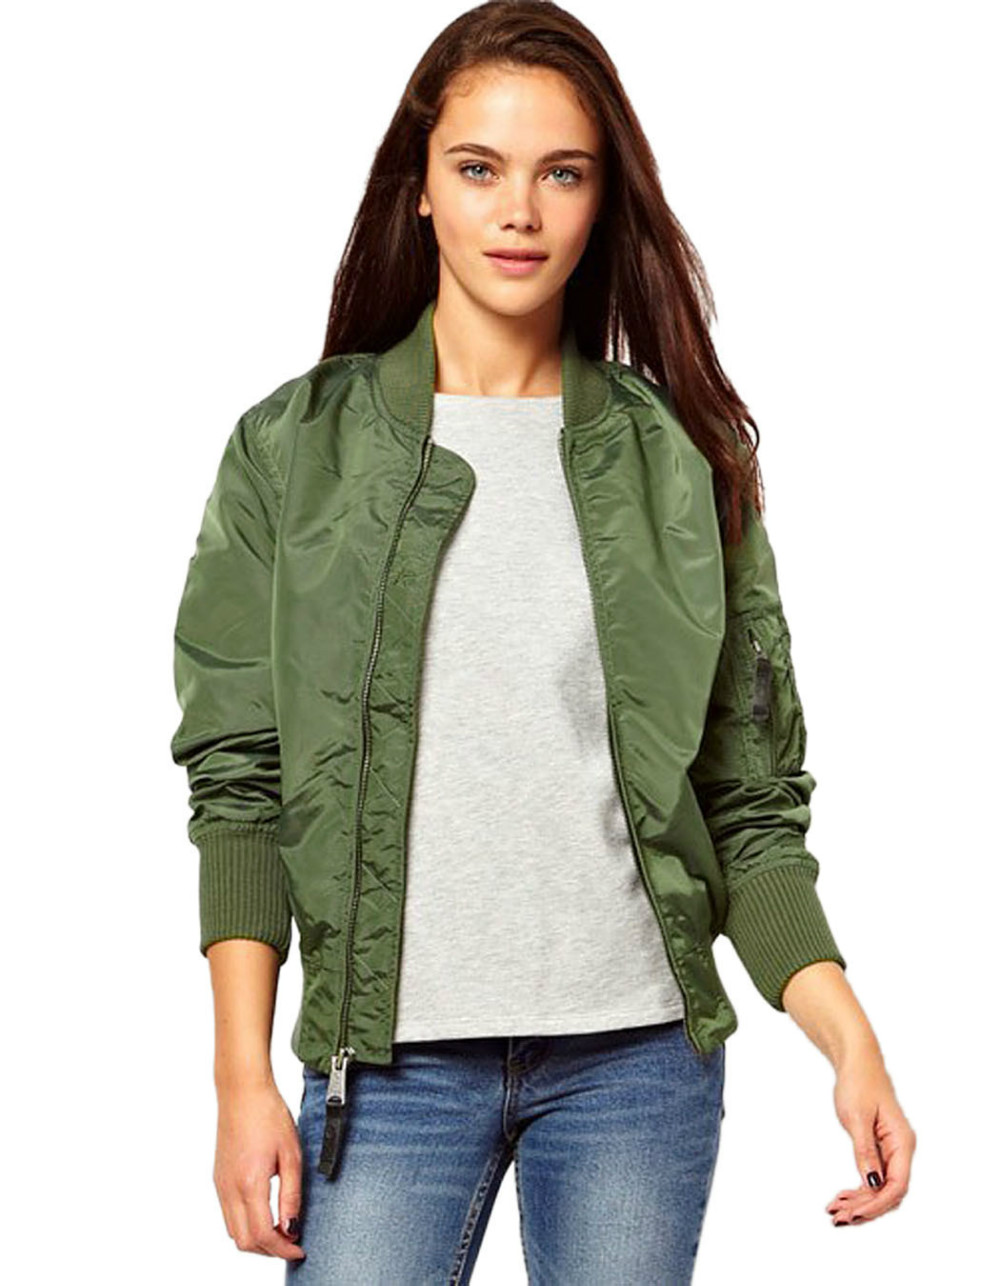 Women army green jacket